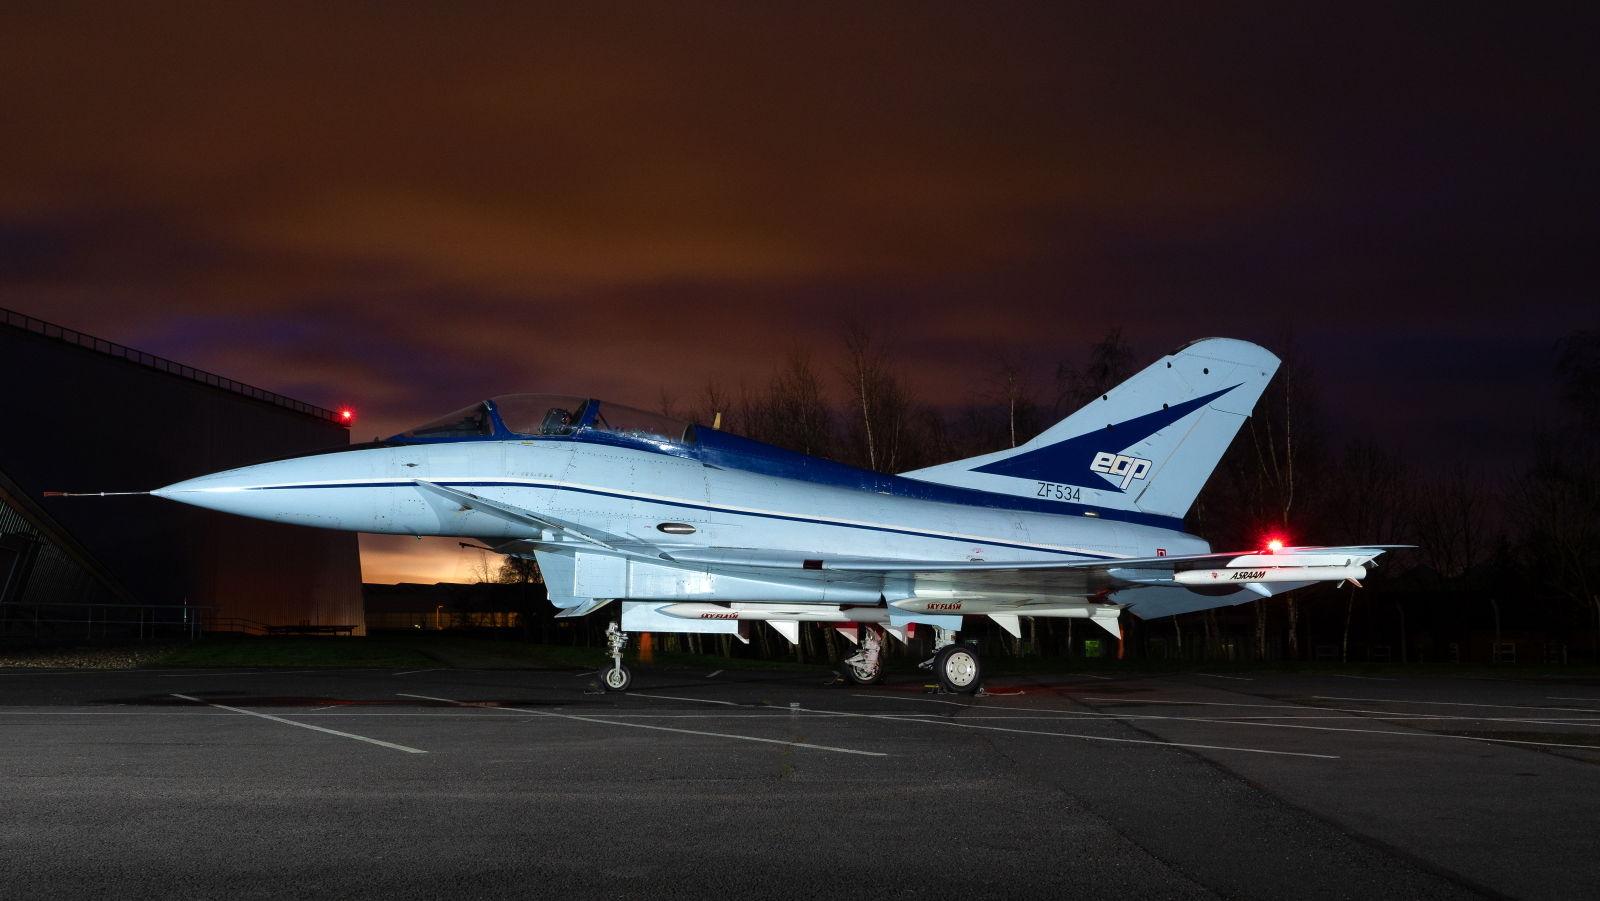 BAe Experimental Aircraft Programme